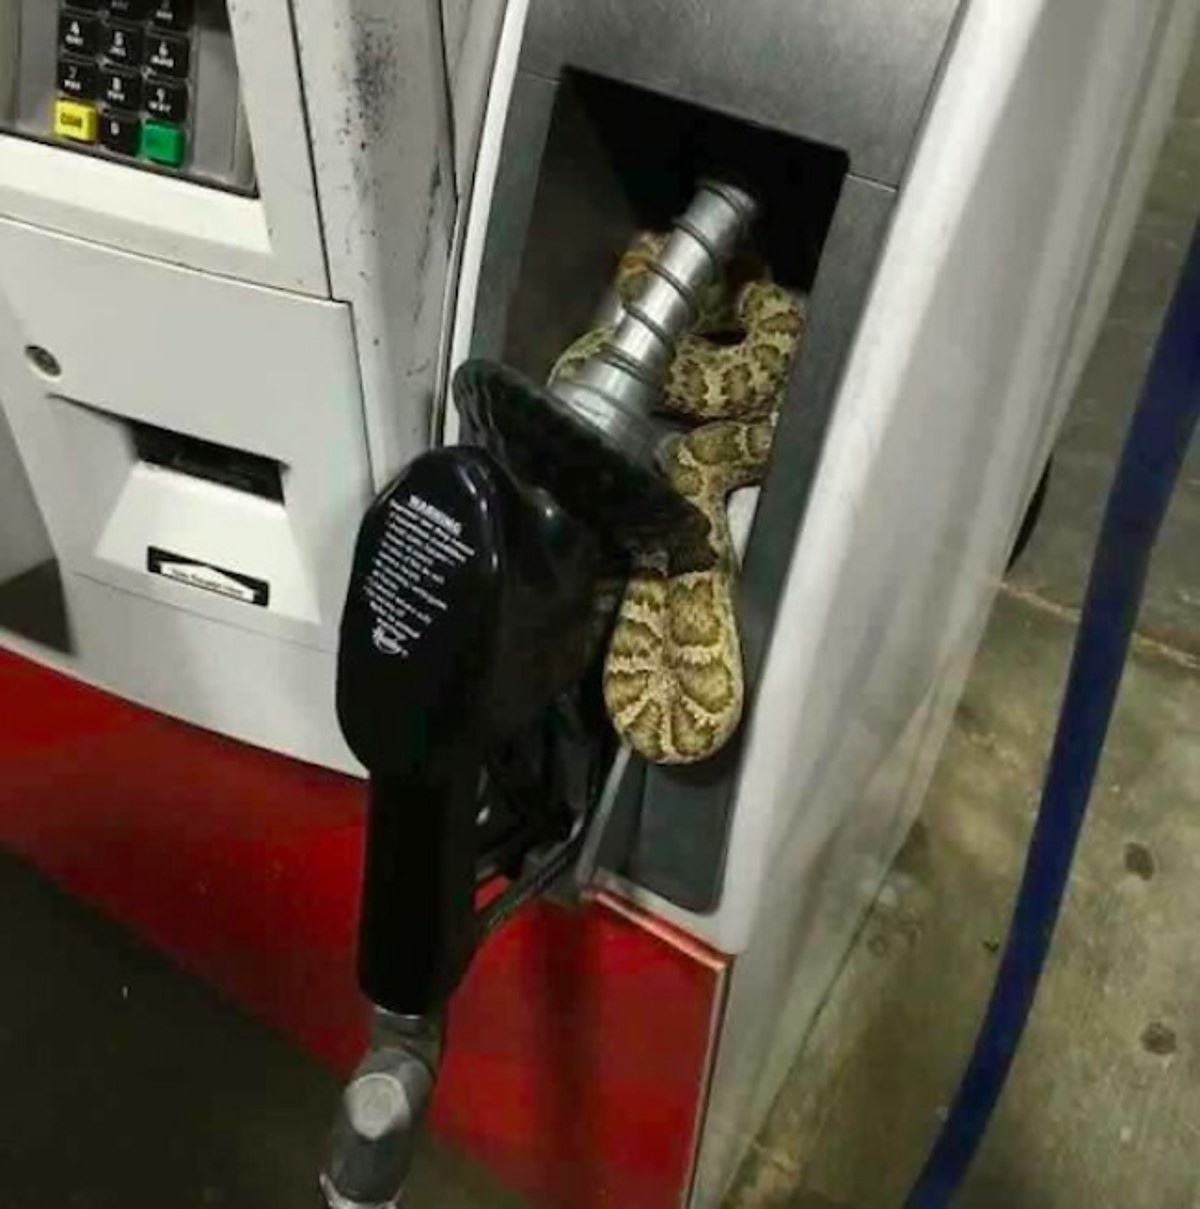 Obrázek Okay-IthinkIcanmakeittothenextgasstation